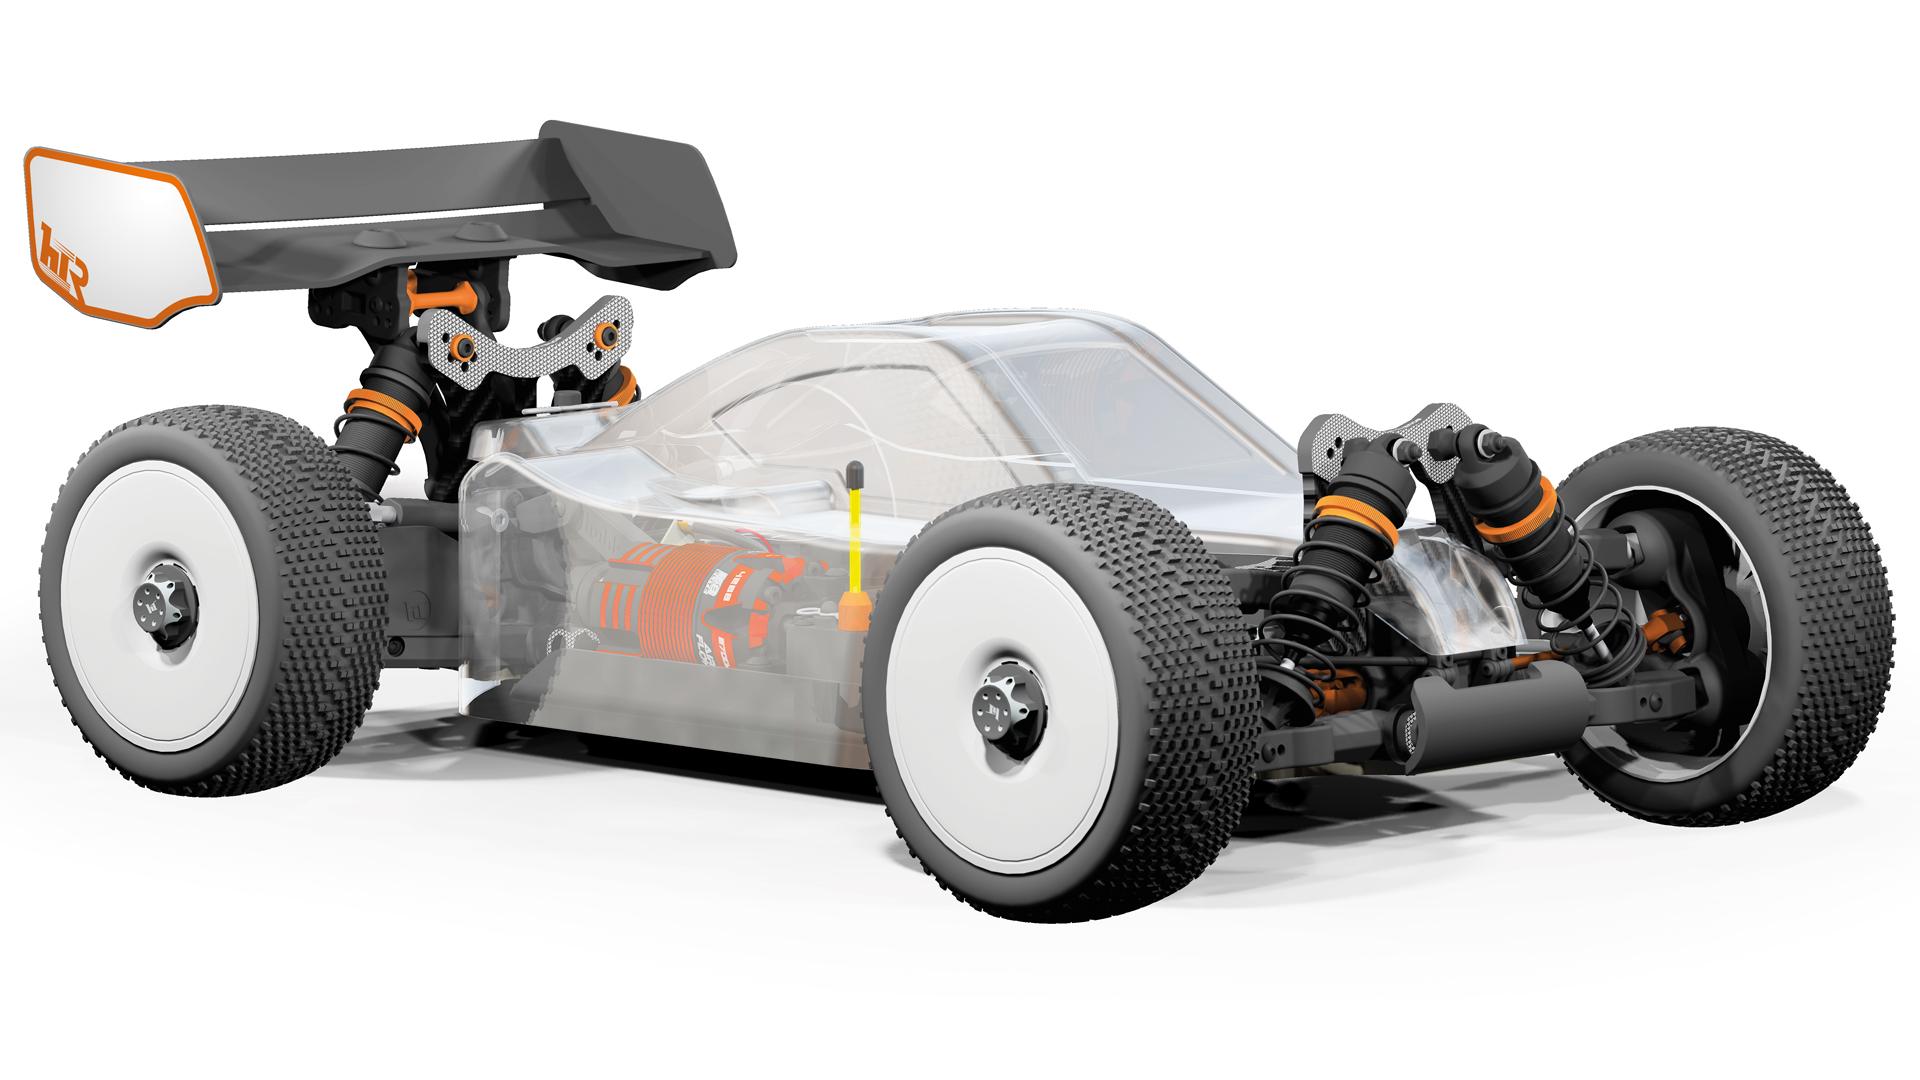 1:8 EP Race Buggy Hobbytech SPIRIT NXTE RR21 EP Kit SPIRIT.NXTE.RR21